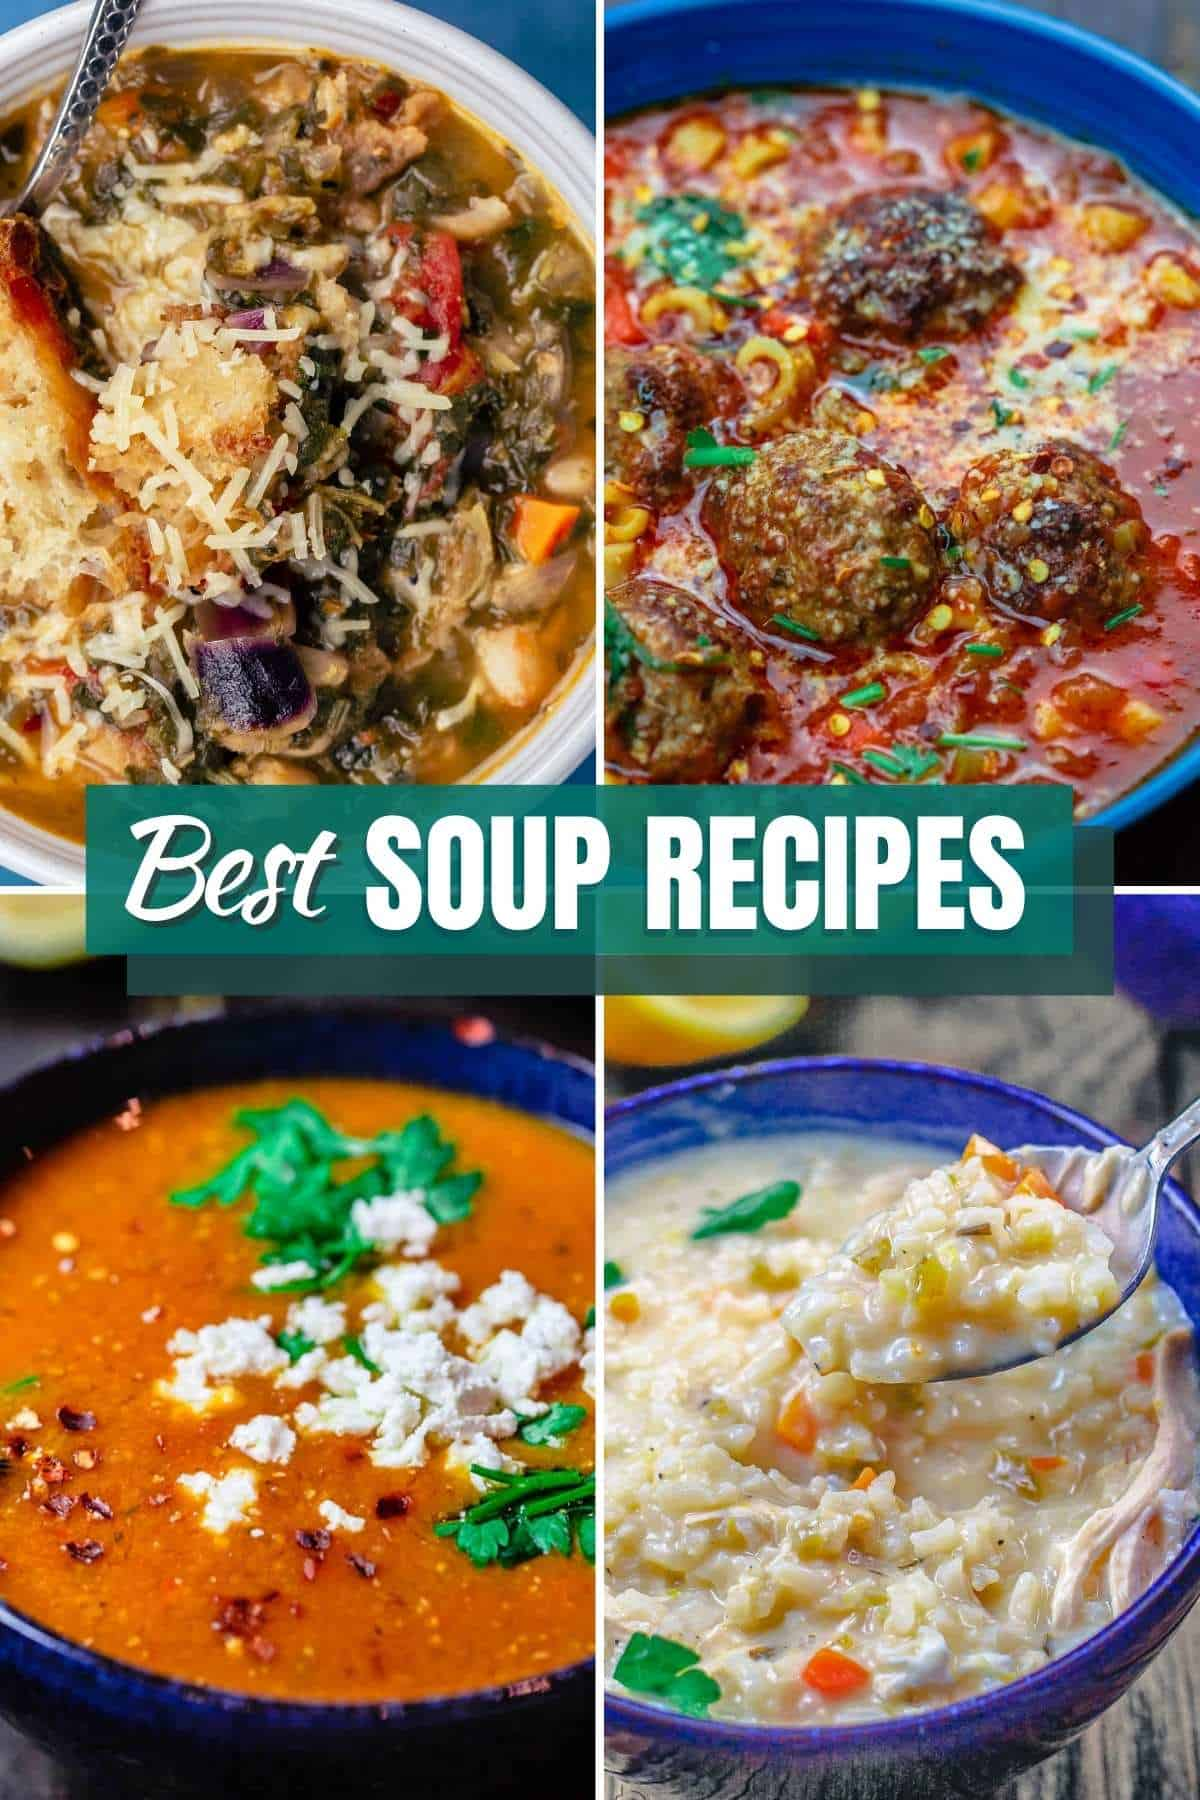 Soup-recipes-TMD-1-41.jpg